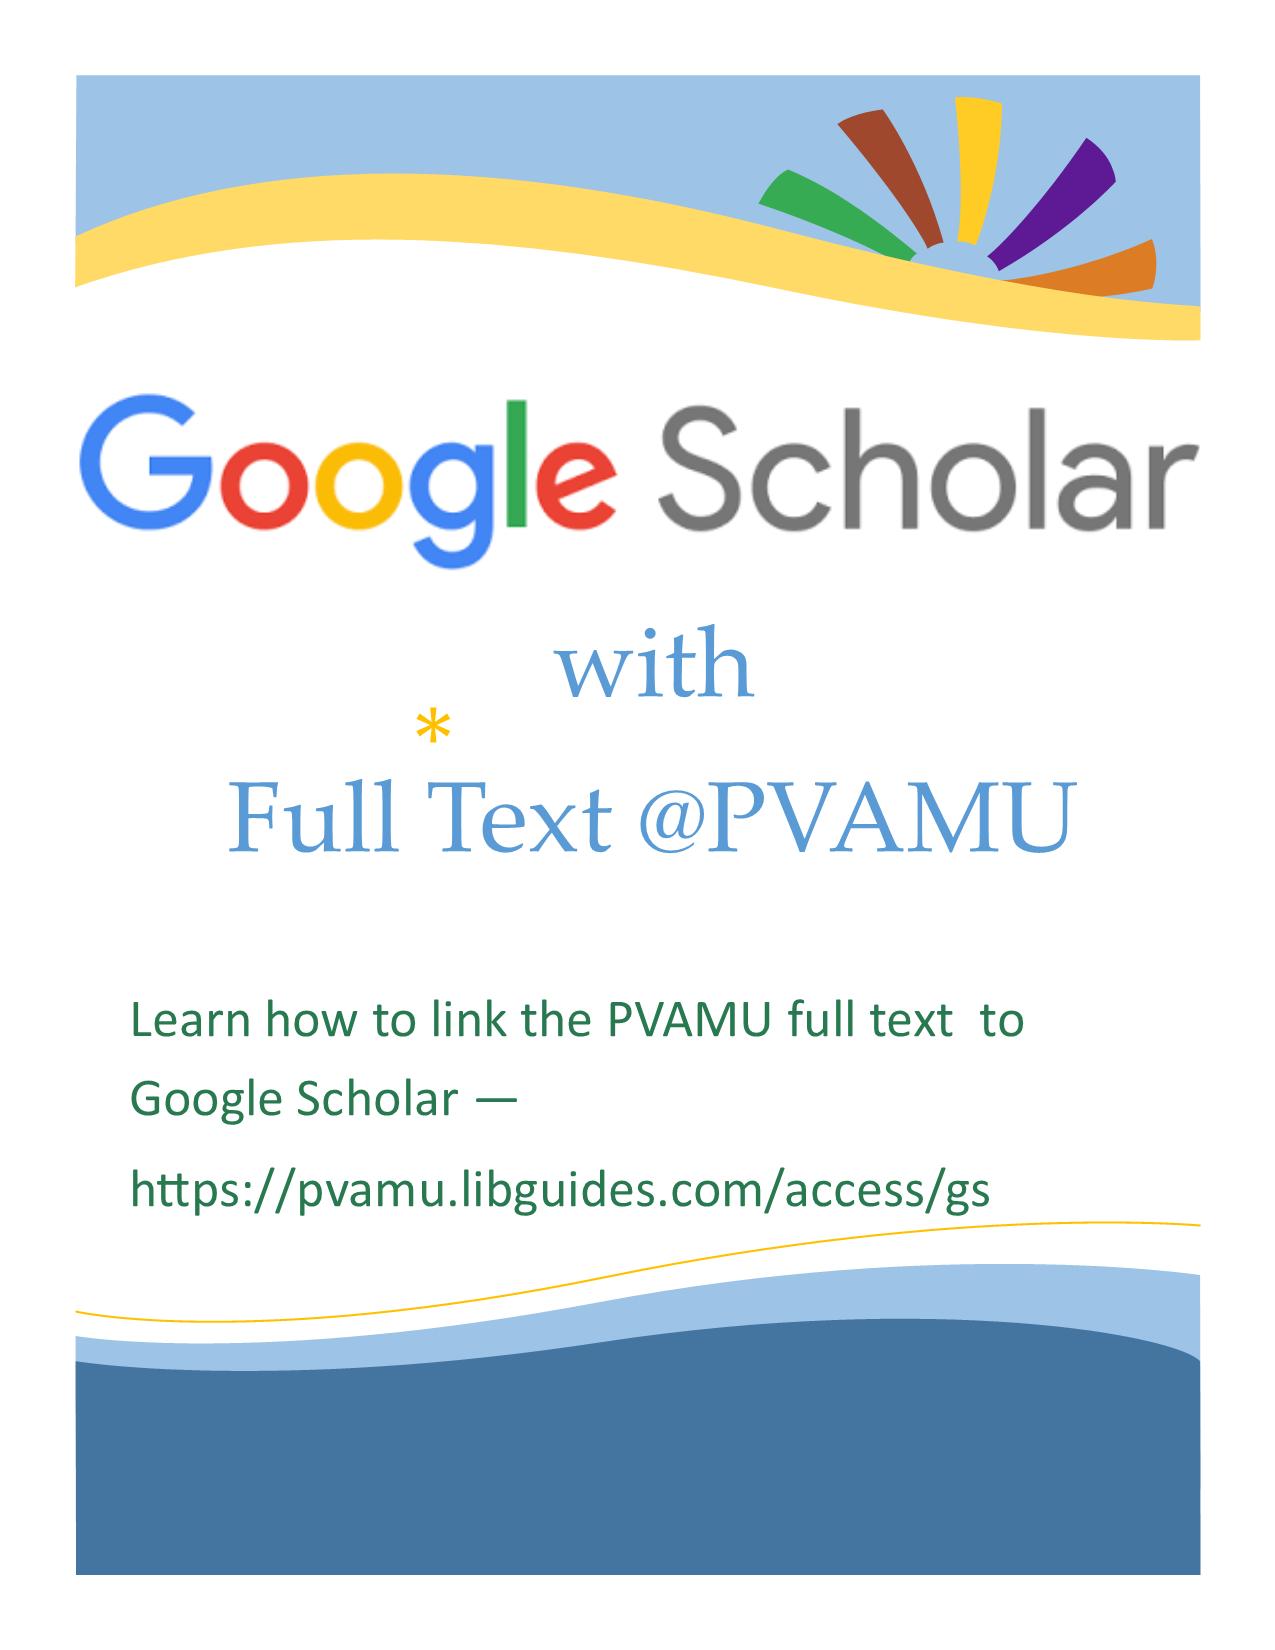 Google Scholar Flyer